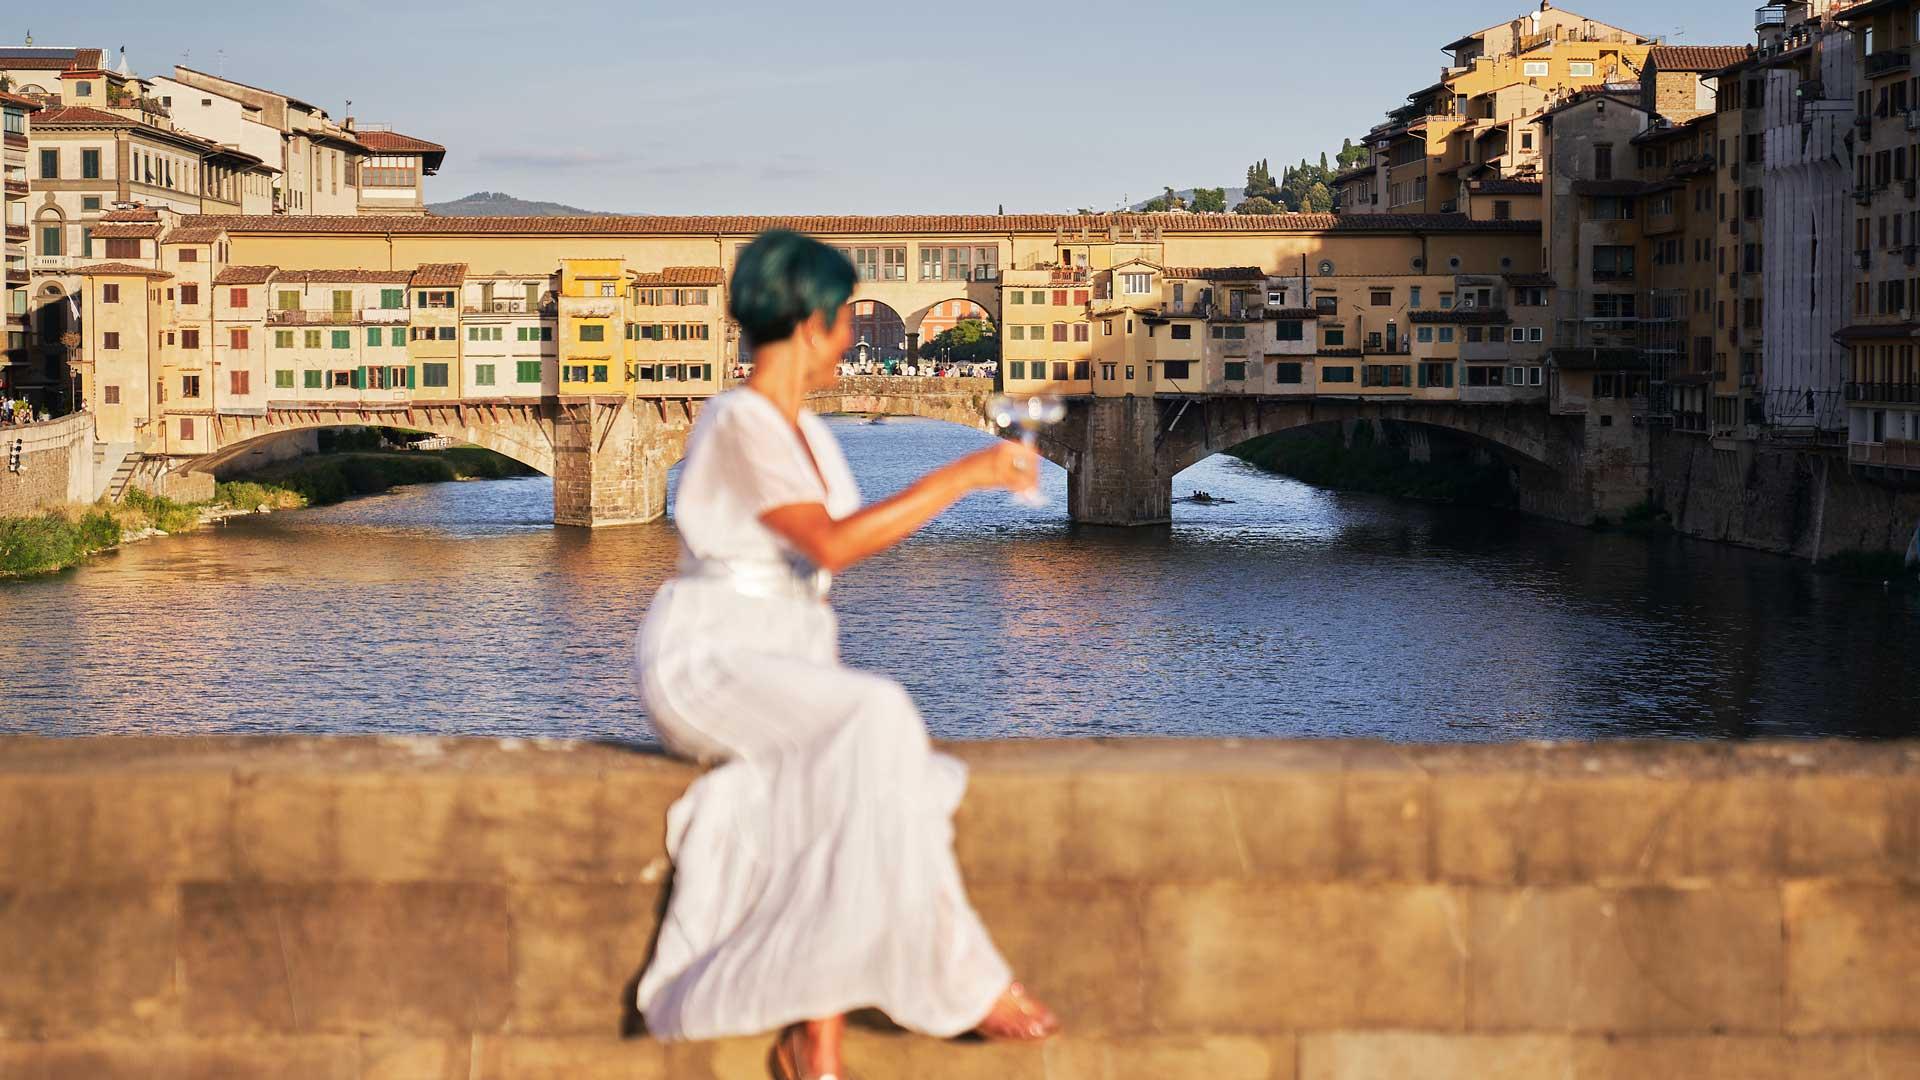 Florence-Cocktail-Week-2020-Paola-Mencarelli-fondatrice-Coqtail-Milano